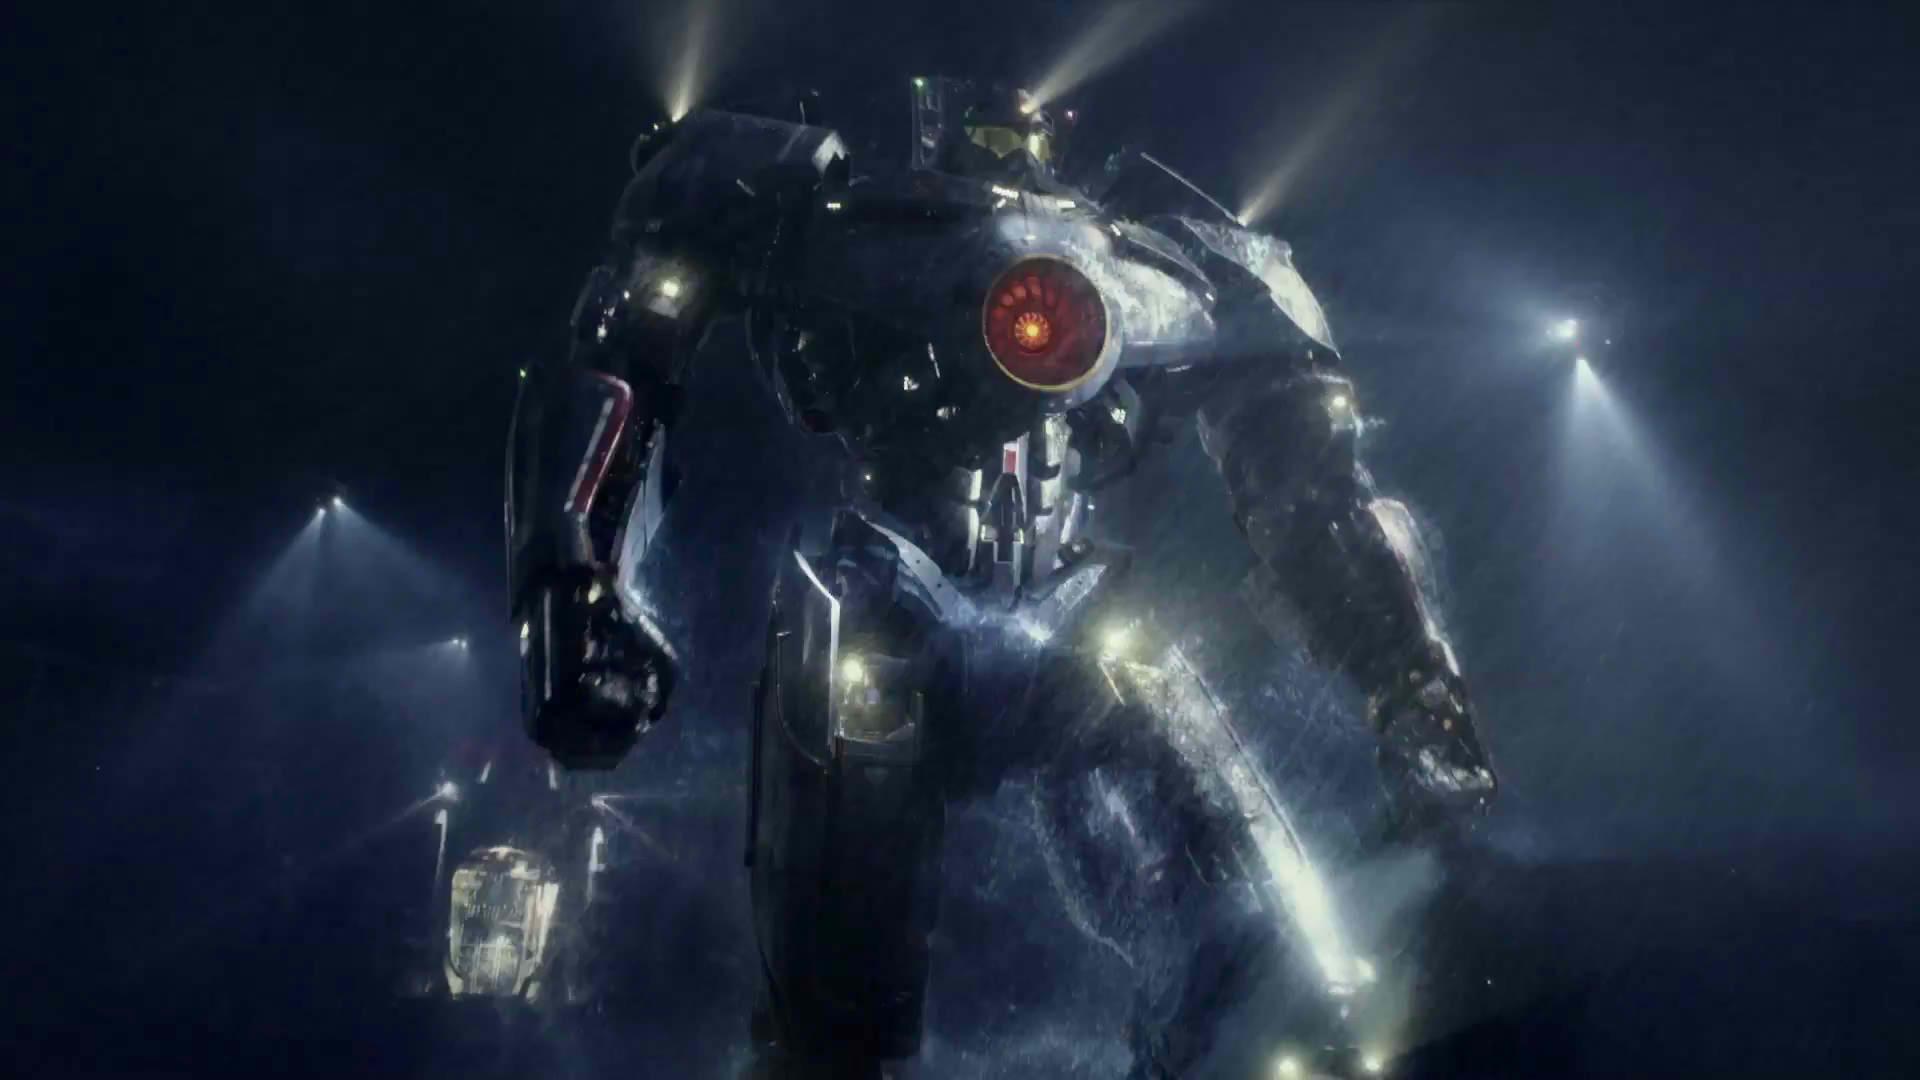 7 Hollywood Blockbuster Elements Del Toro Used in Pacific Rim Pacific Rim Jaeger Gypsy Danger Blueprint